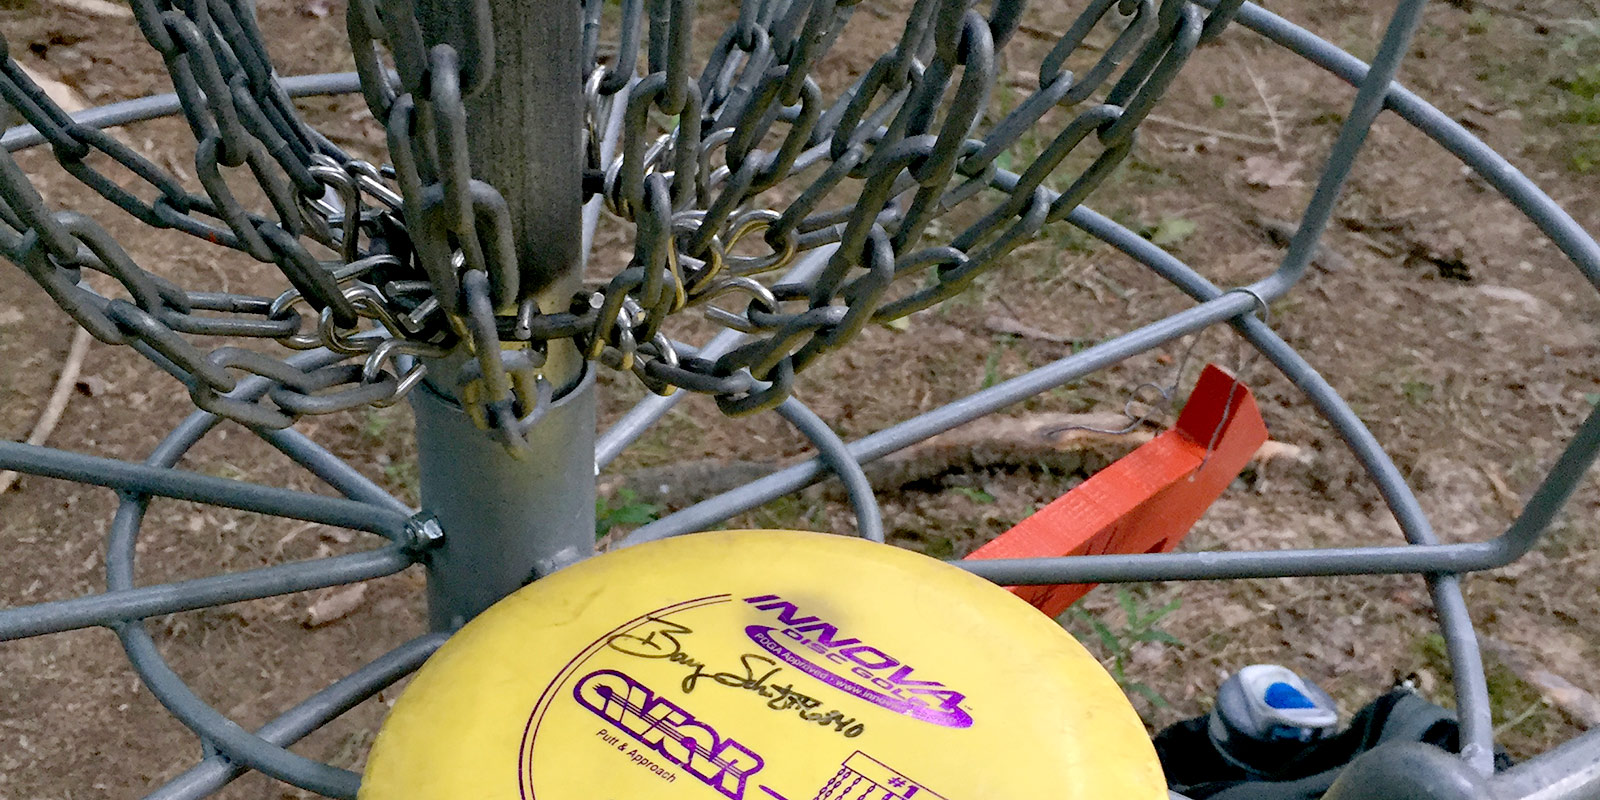 disc golf disc in a basket